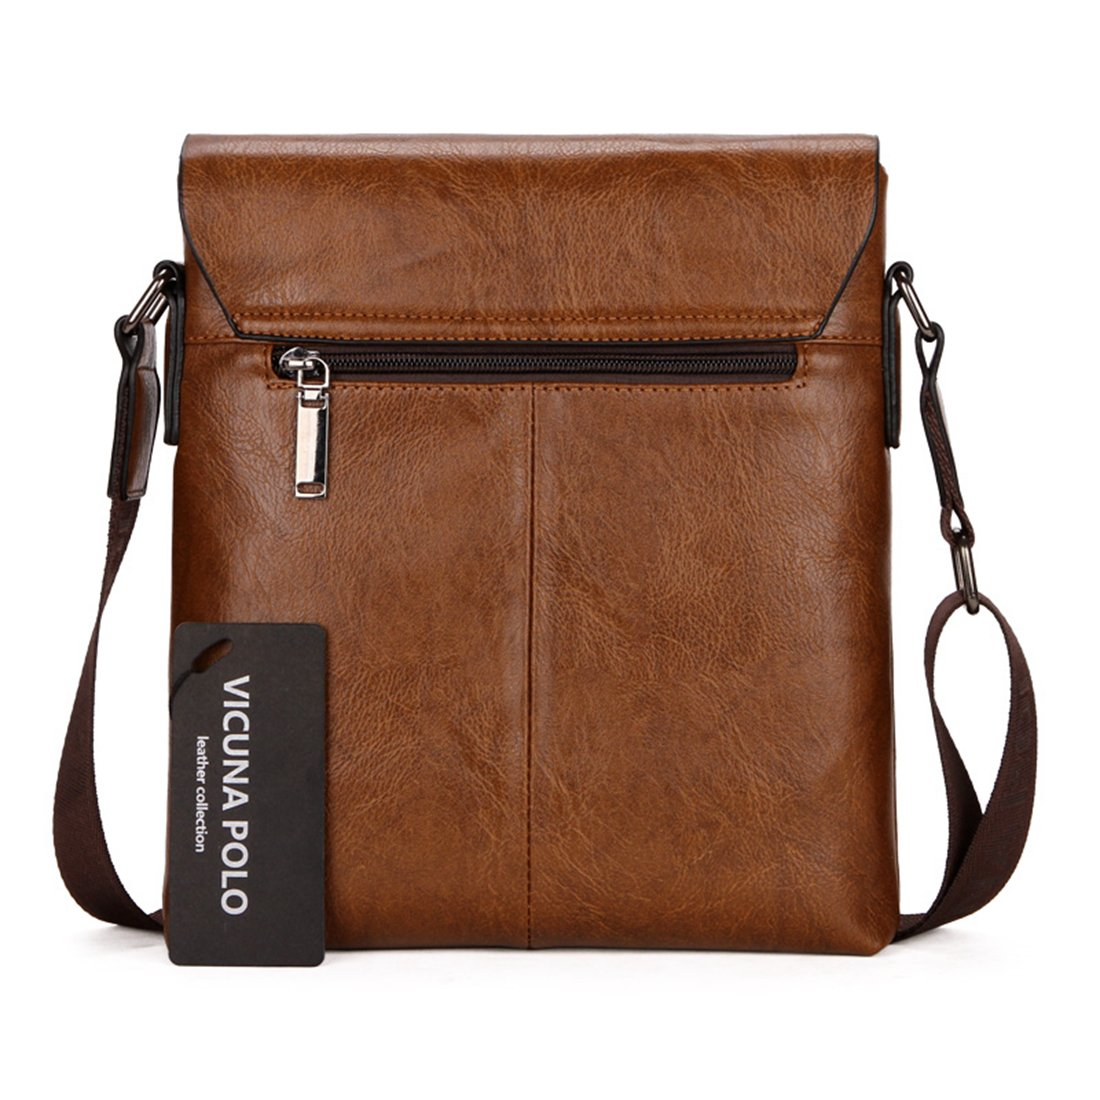 764d45bbbd VICUNA POLO Men Messenger Bag High Quality Leather Crossbody Bag Shoulder  Bag (Khaki)  Amazon.co.uk  Shoes   Bags